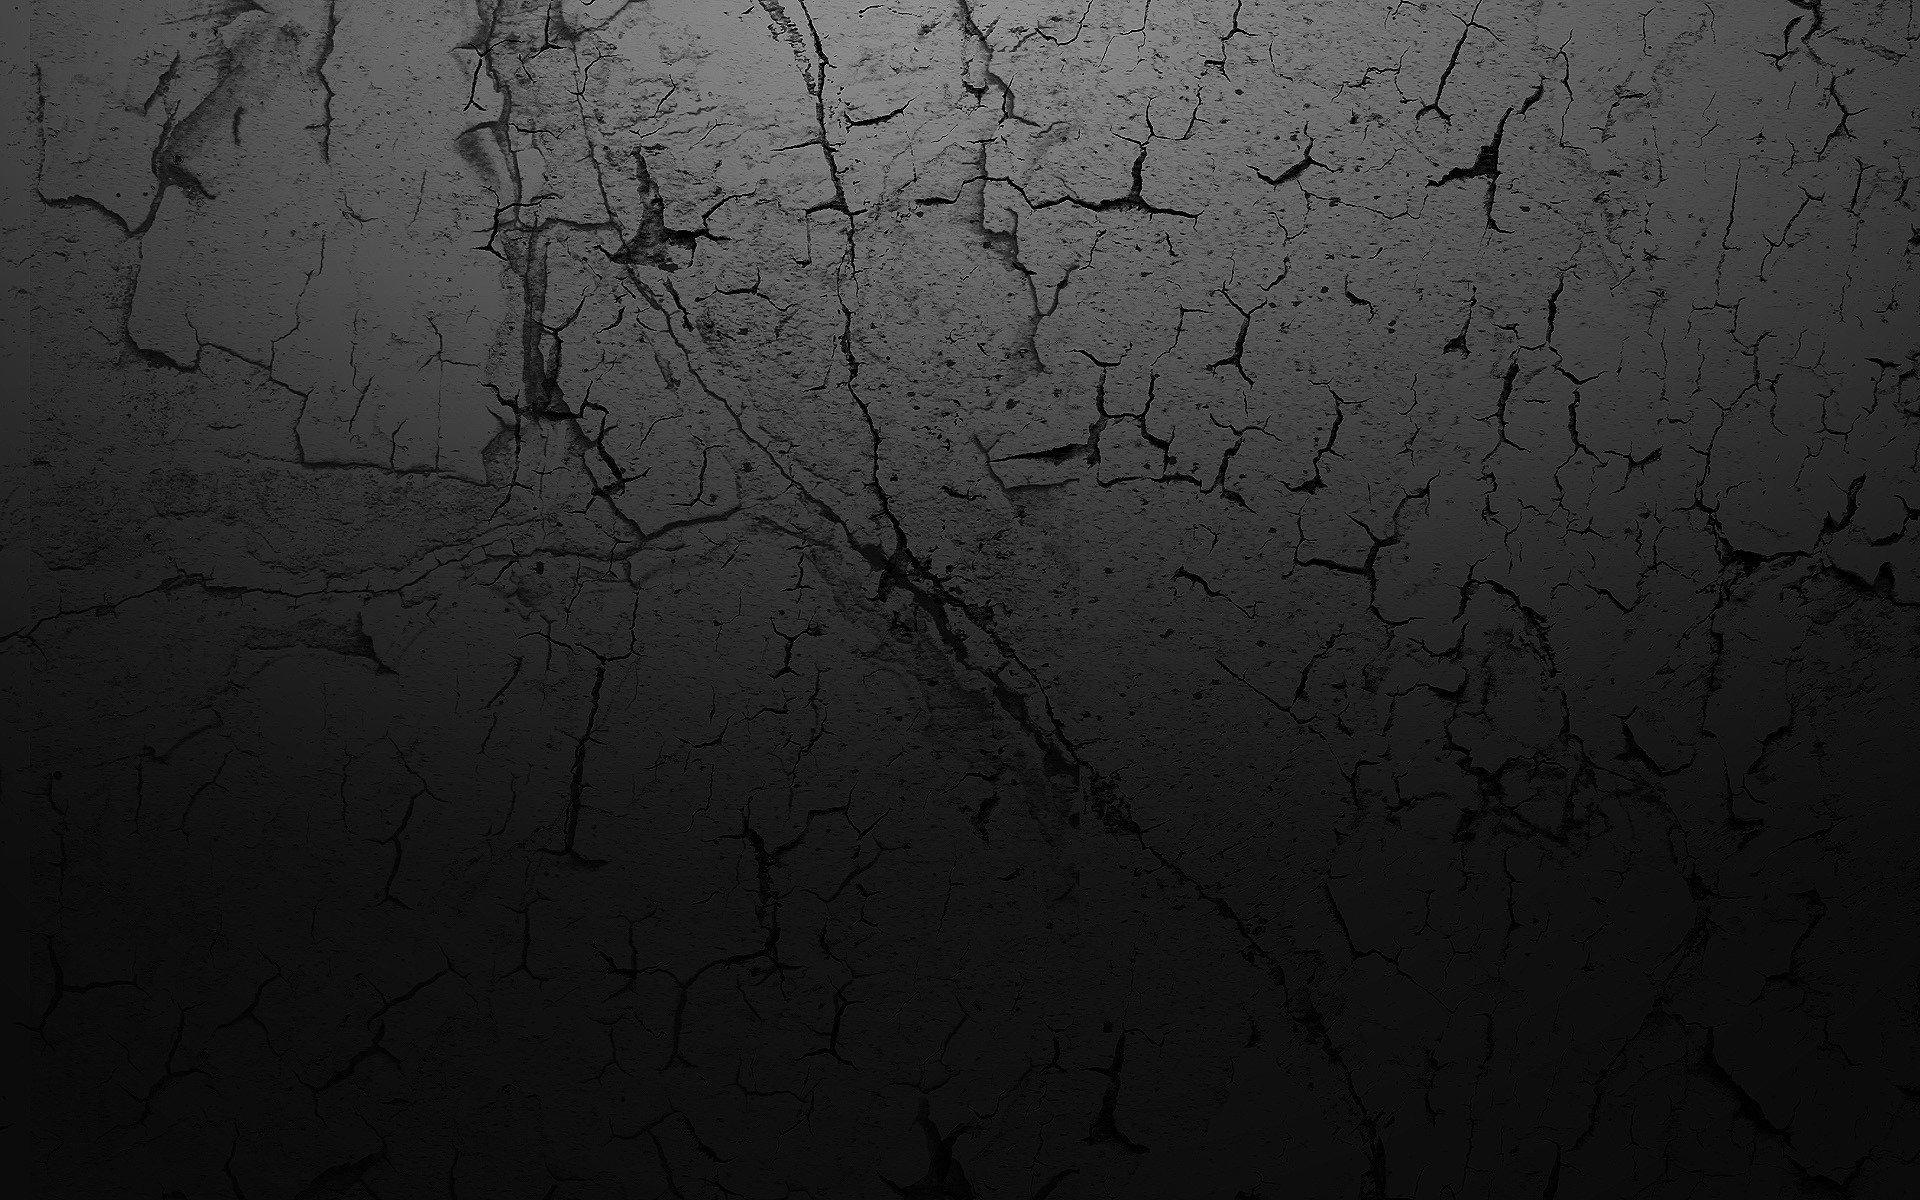 Picture Texture wall cracks background art wallpaper 1920x1200 1920x1200